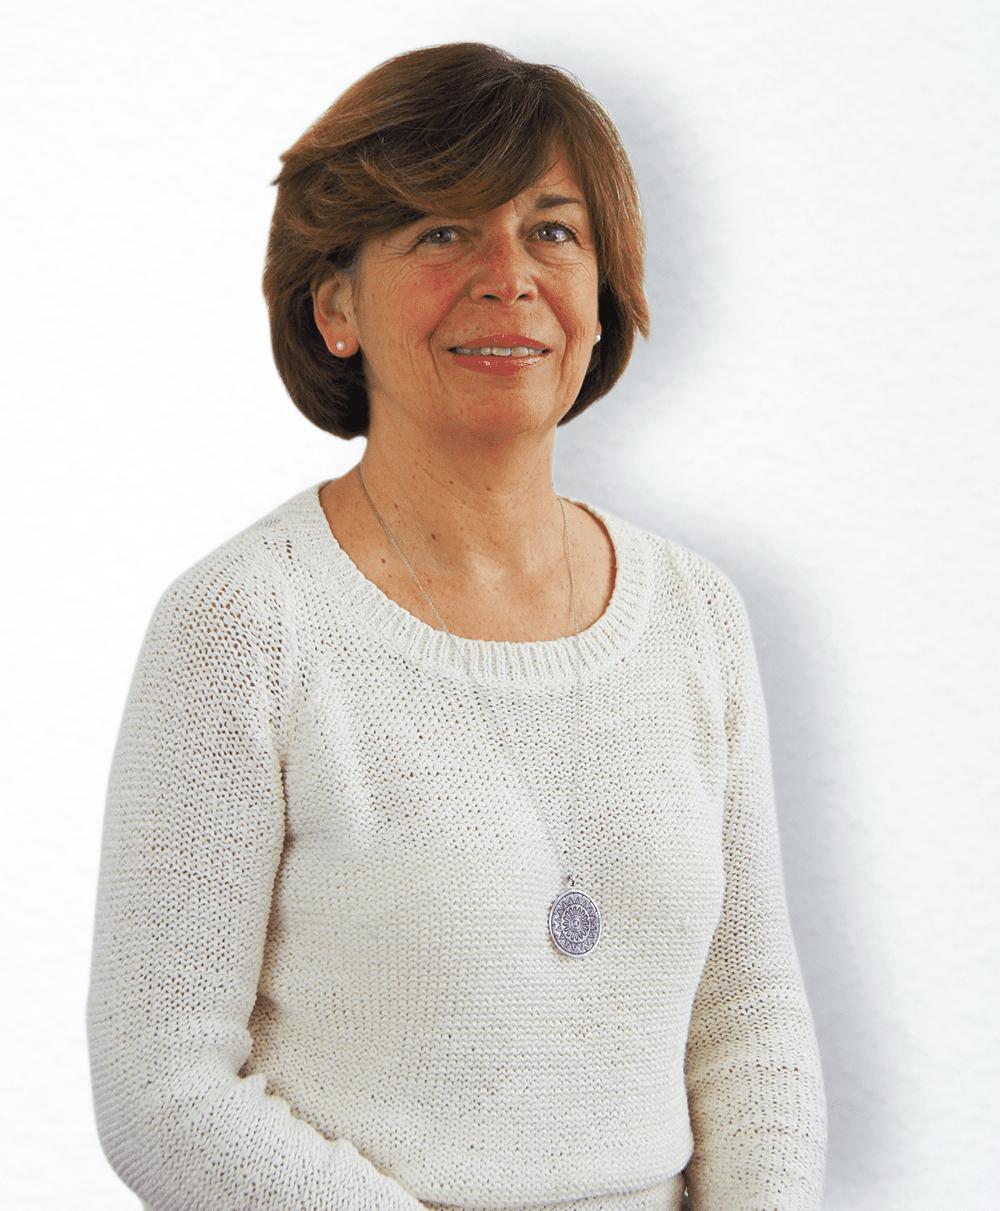 Nadine Vallet